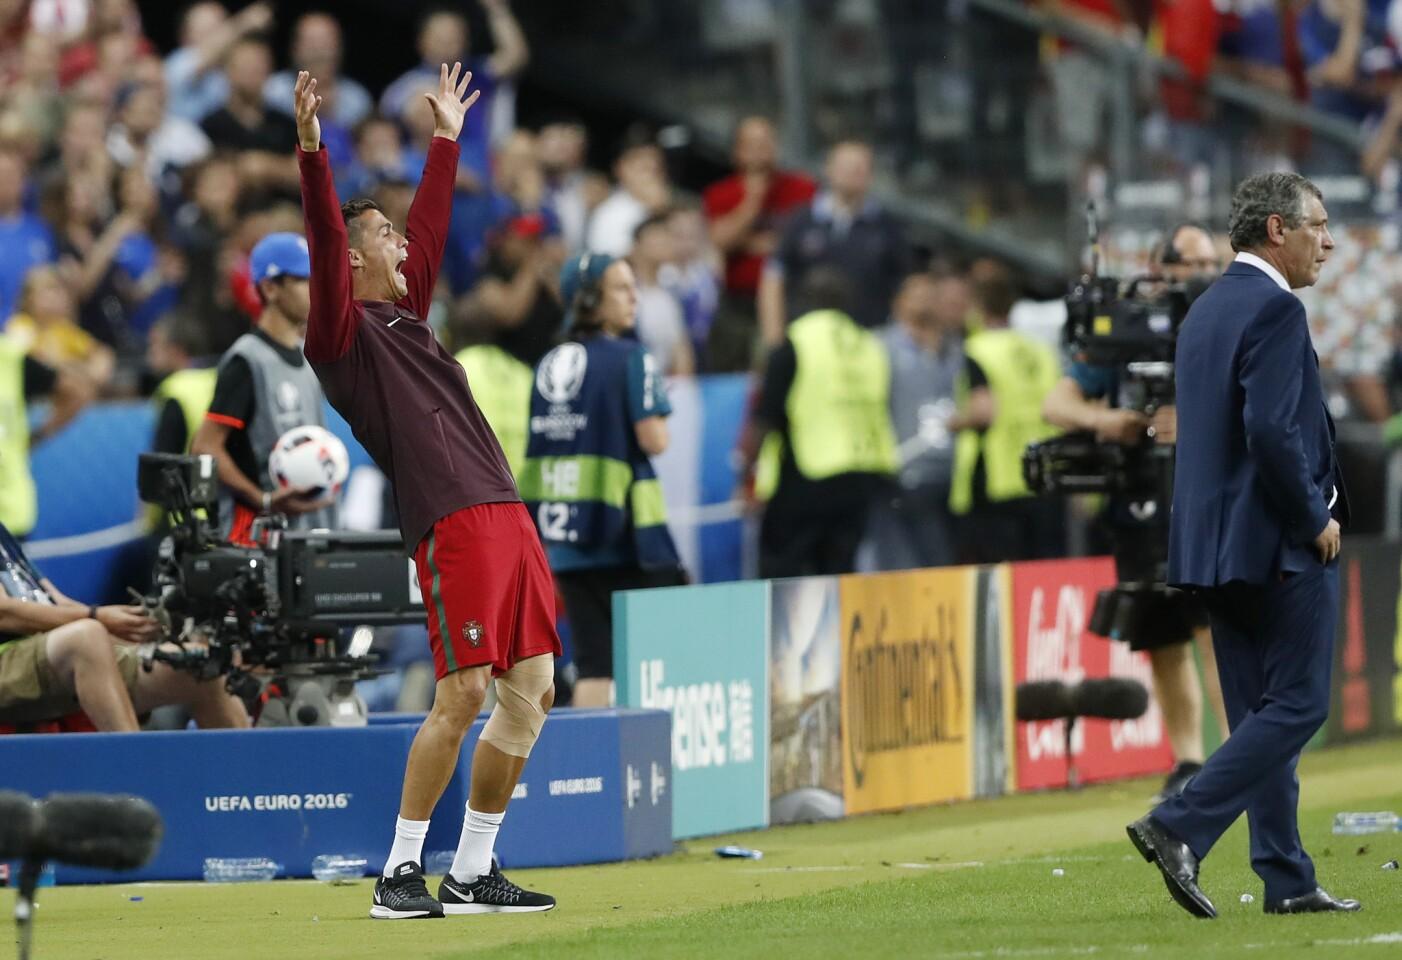 Football Soccer - Portugal v France - EURO 2016 - Final - Stade de France, Saint-Denis near Paris, France - 10/7/16 Portugal's Cristiano Ronaldo REUTERS/Carl Recine Livepic ** Usable by SD ONLY **